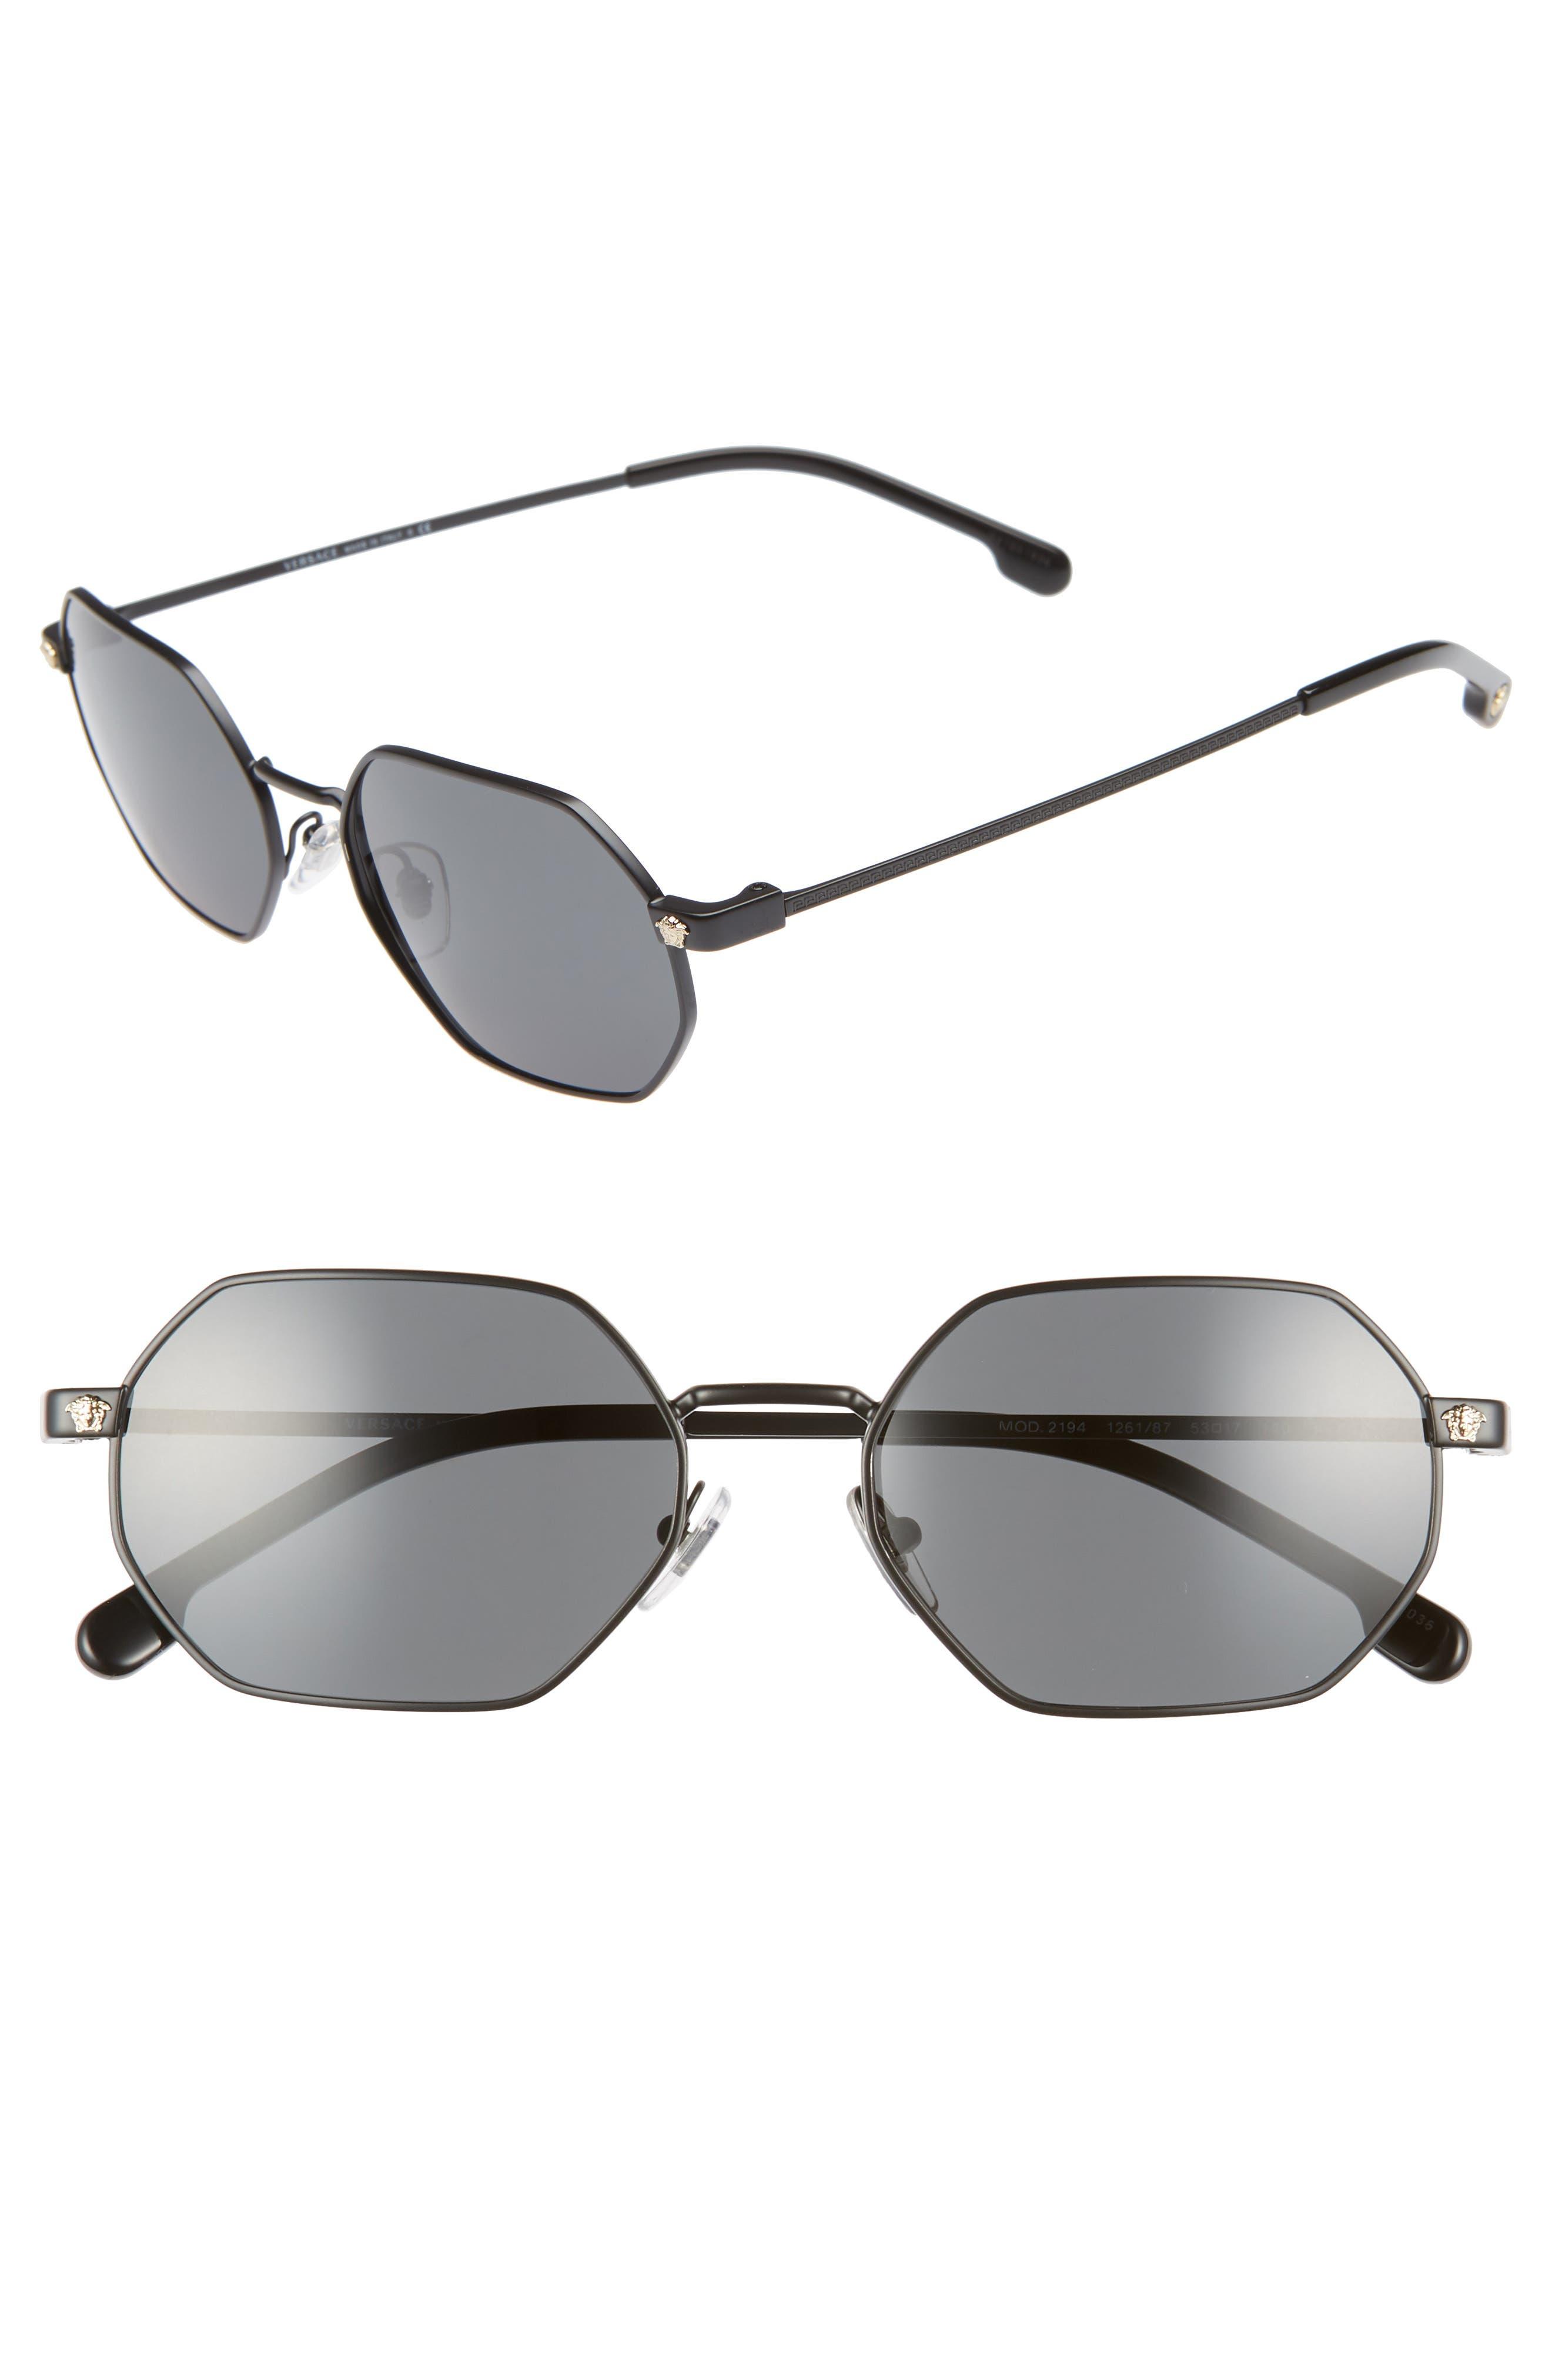 53Mm Hexagon Sunglasses - Matte Black Solid